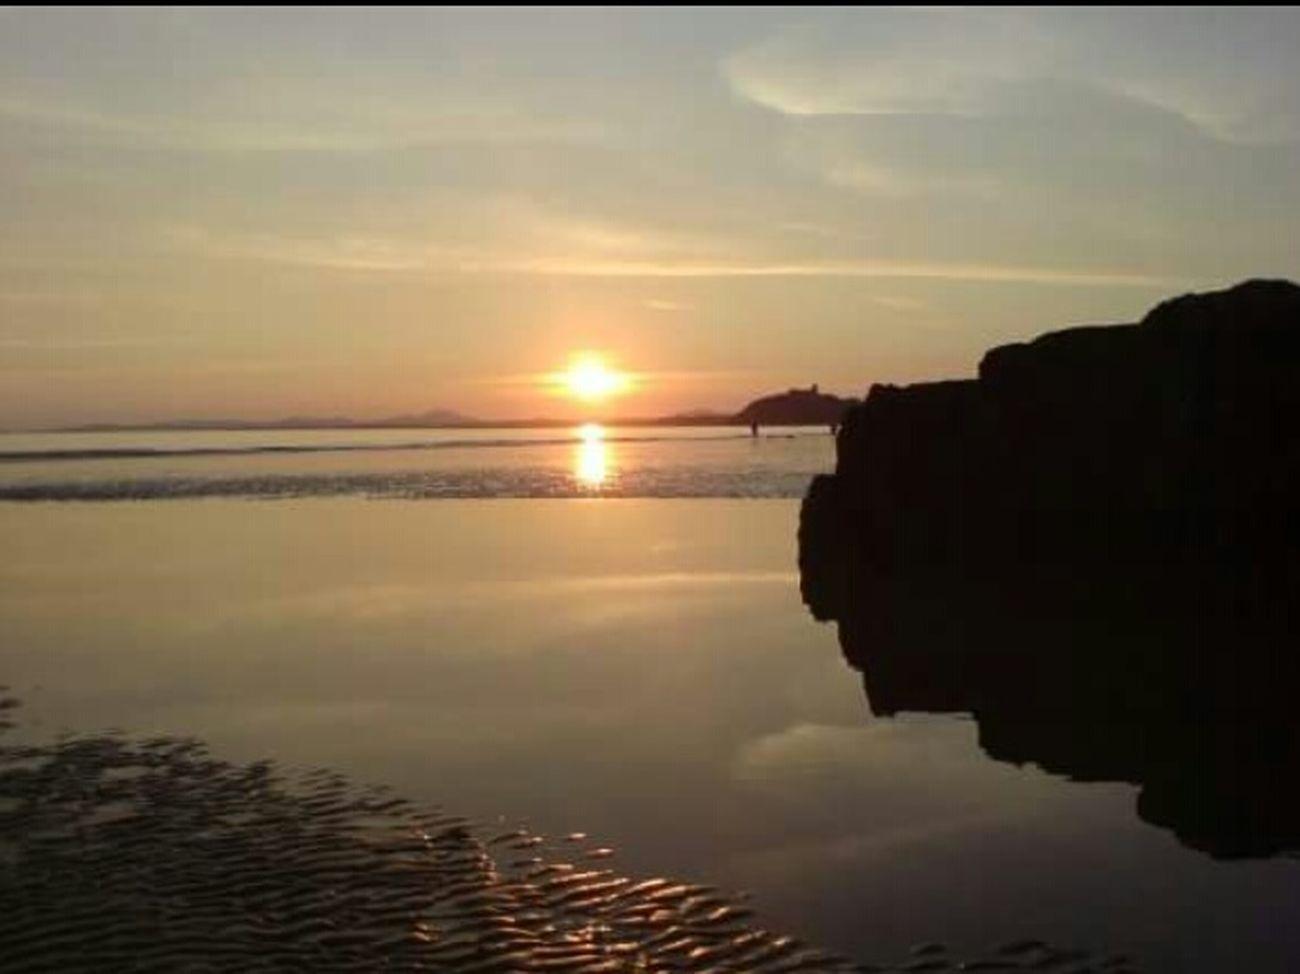 Blackrock sands Blackrock Wales Beach Beachphotography Sunset Silhouettes Sunset Castle Sand Water Reflection